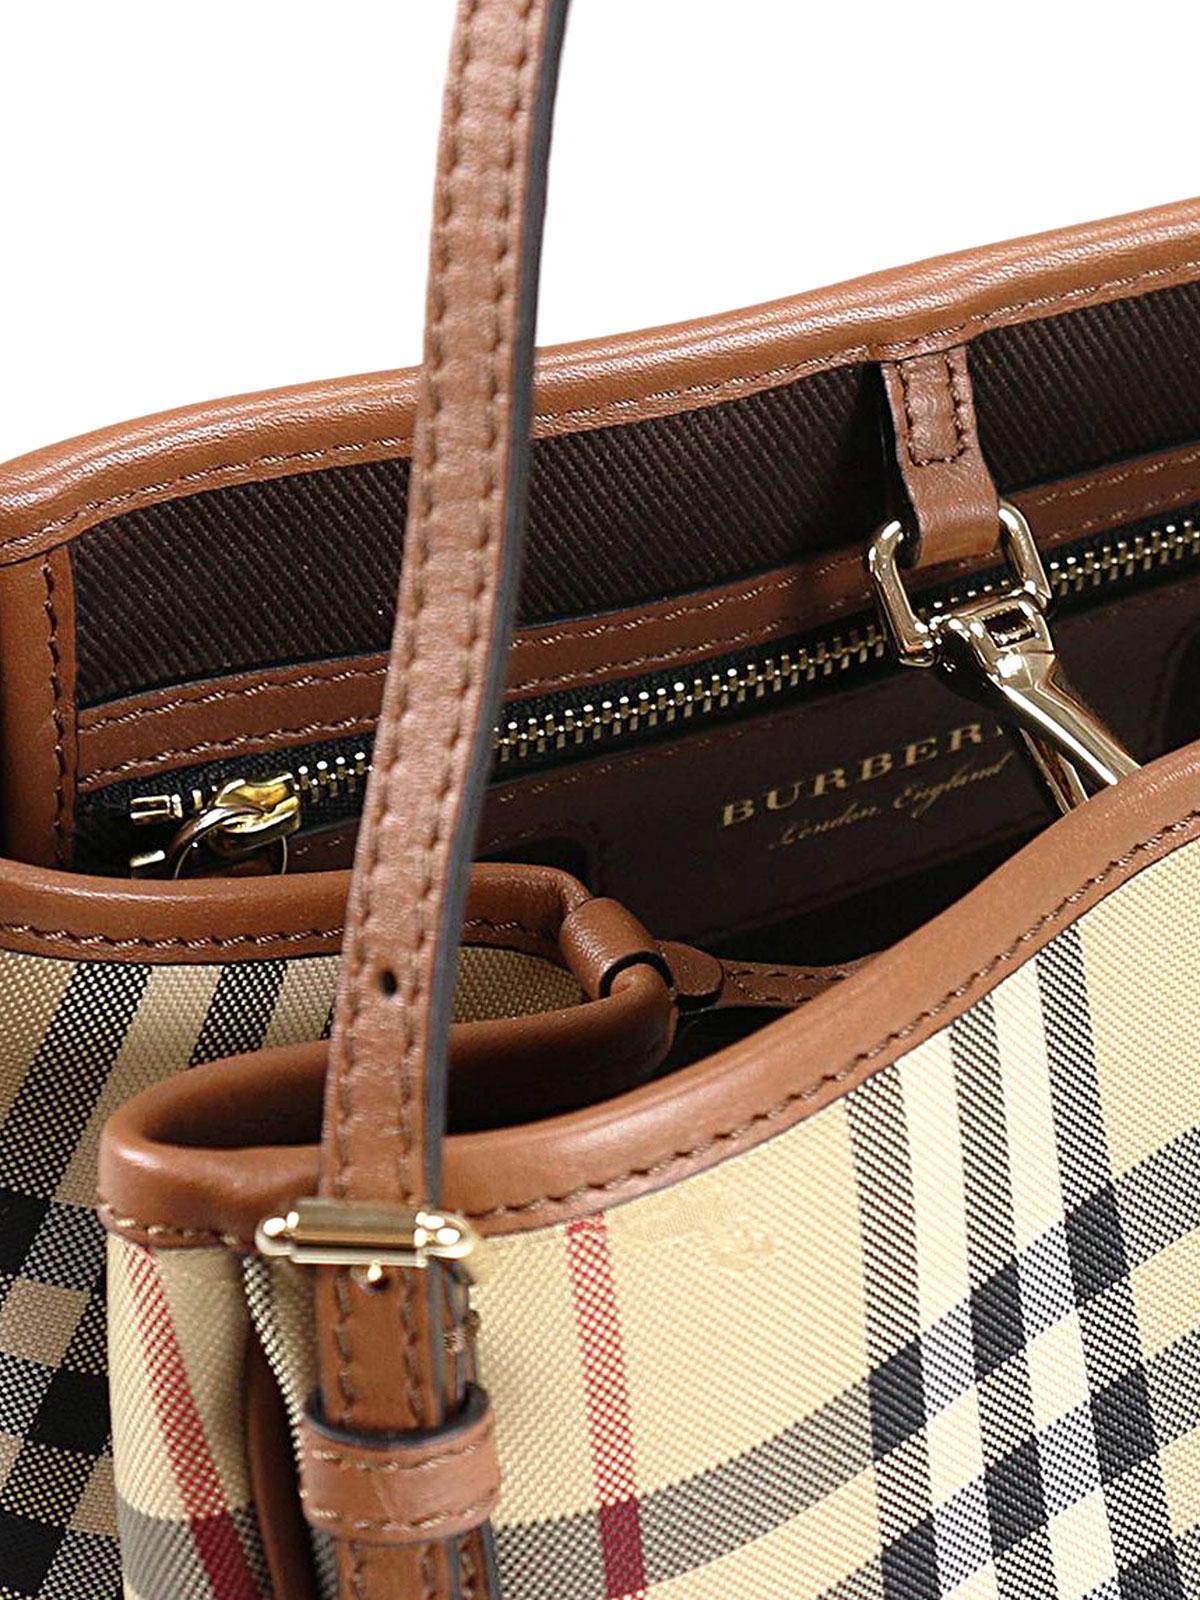 f1c4e3c447ff Burberry - Mini Canter Horseferry check tote - totes bags - 40223691